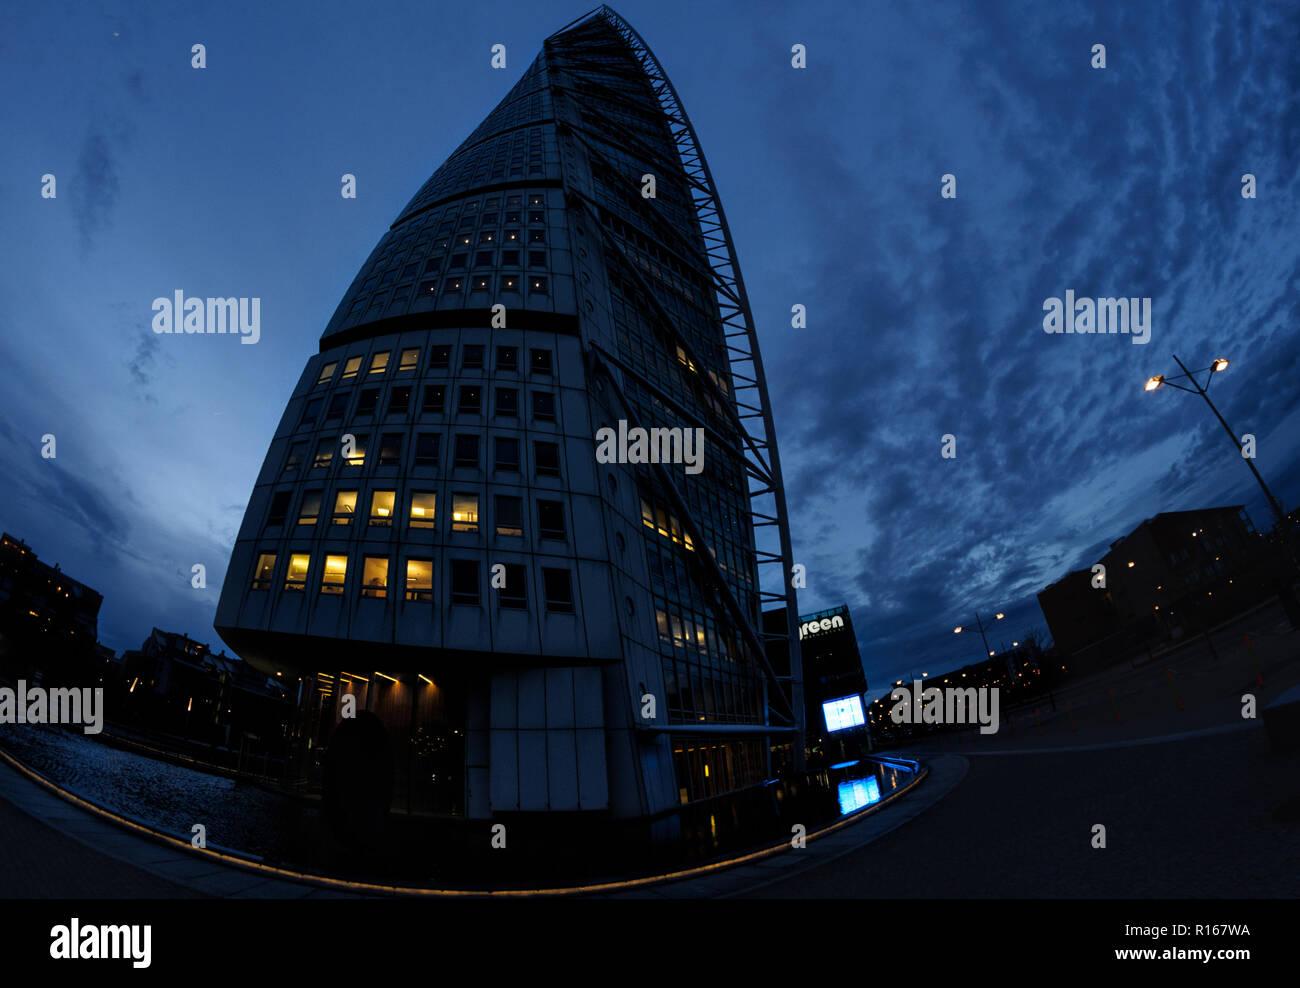 Turning Torso Malmo Sweden - Stock Image